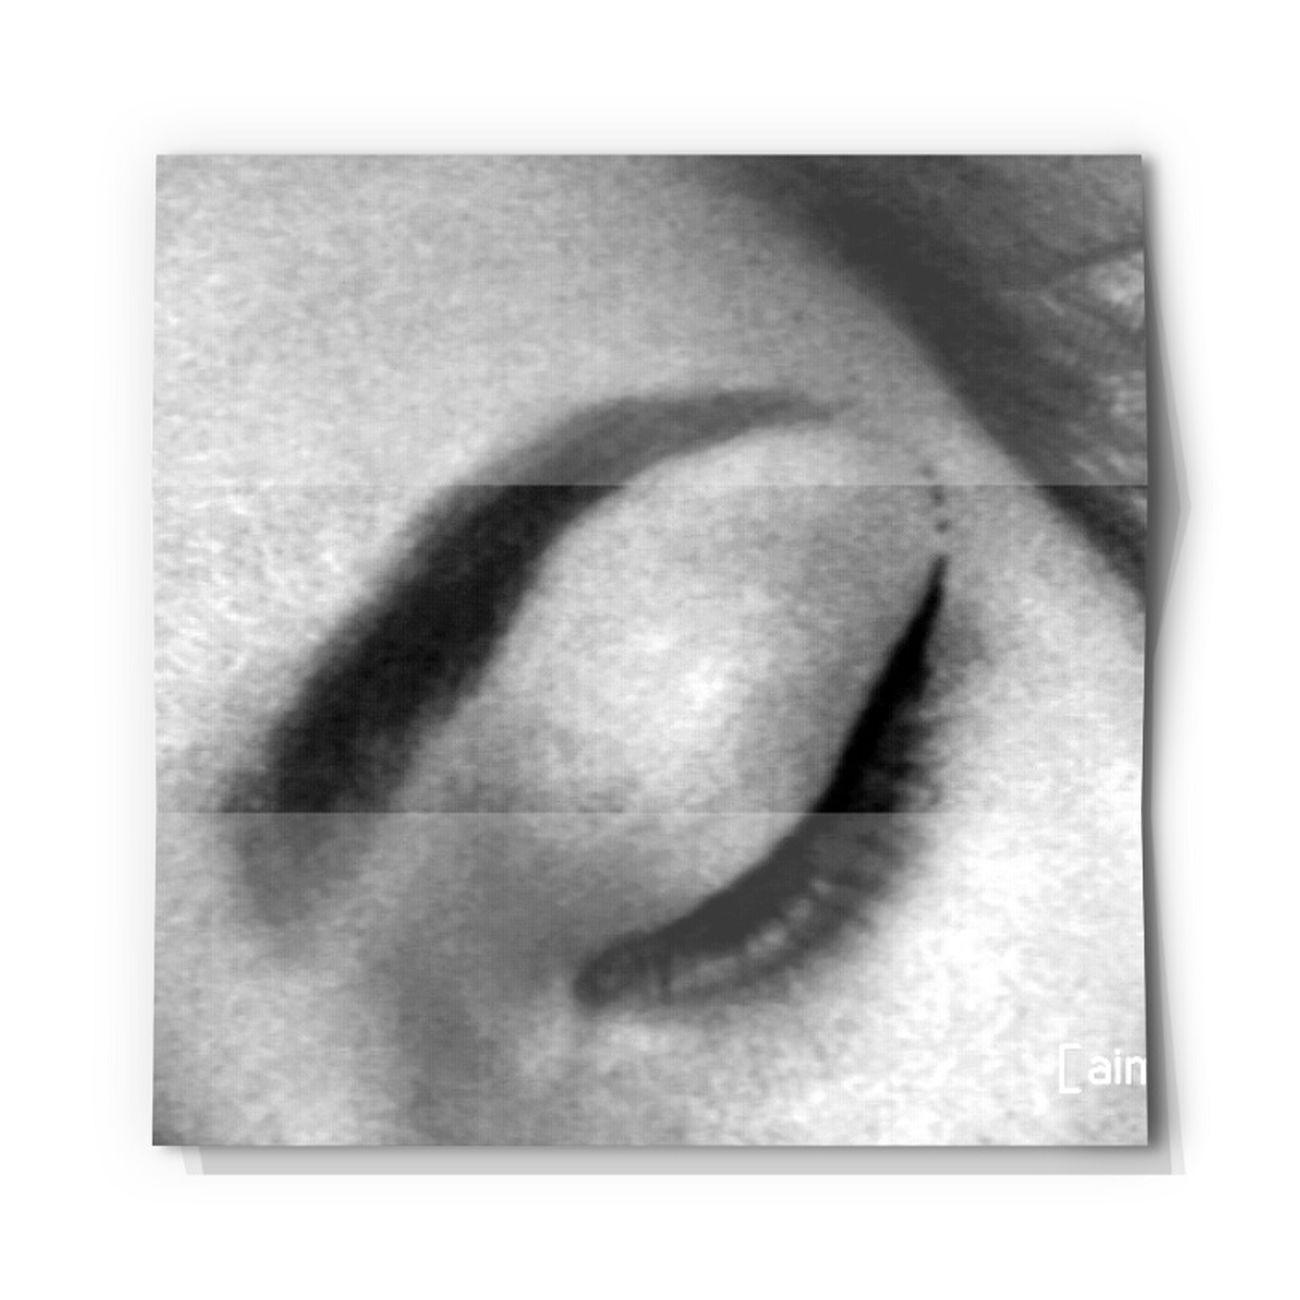 Eye Natural Beauty Still Life Lipliner Fleekbrows Girl Power Owl Eyes Loveit Lifestyles Türkiye